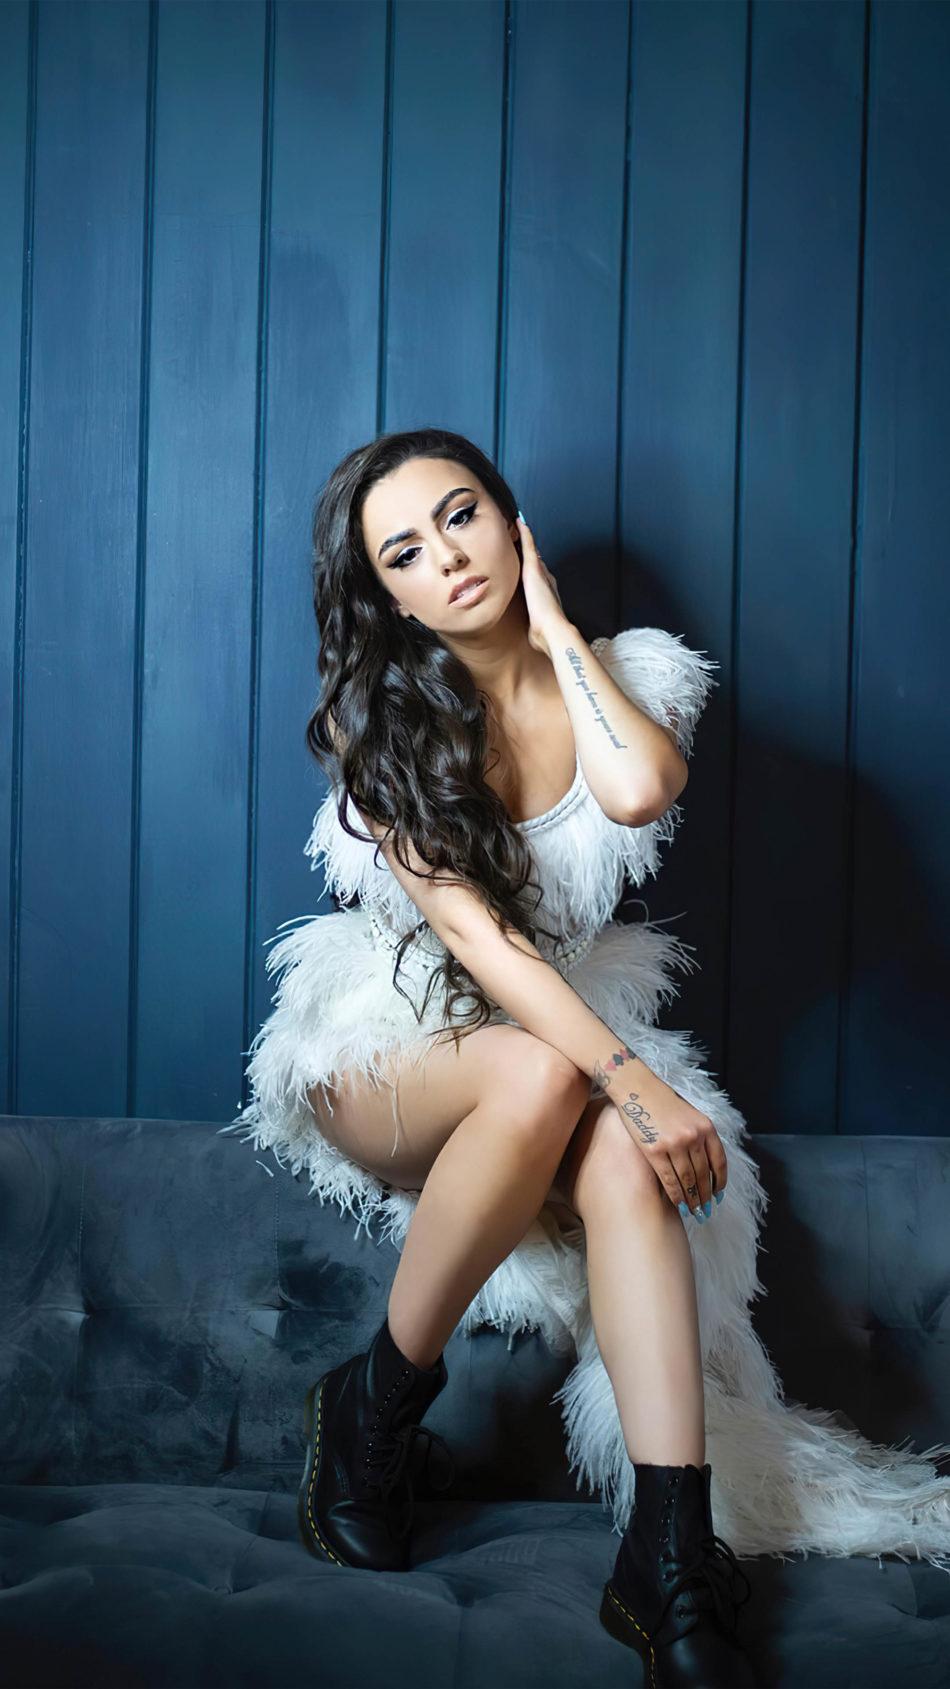 Cher Lloyd 2020 4K Ultra HD Mobile Wallpaper